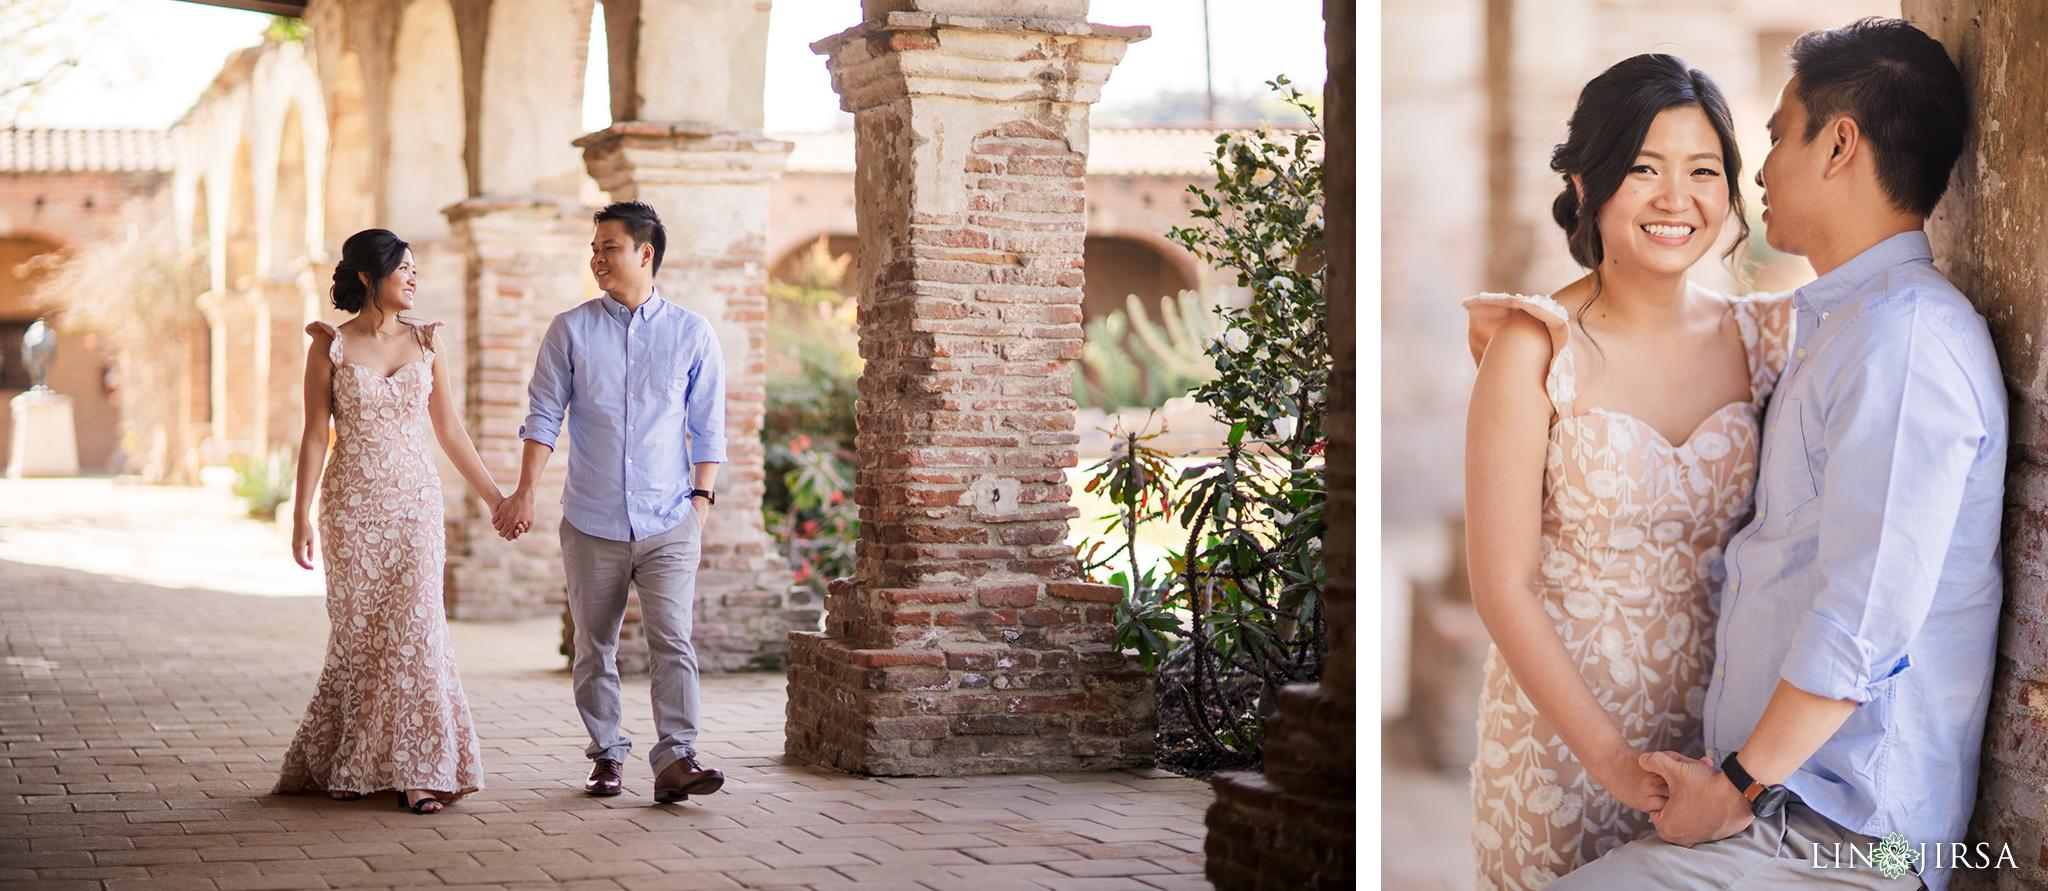 03 Mission San Juan Capistrano Engagement Photography 1